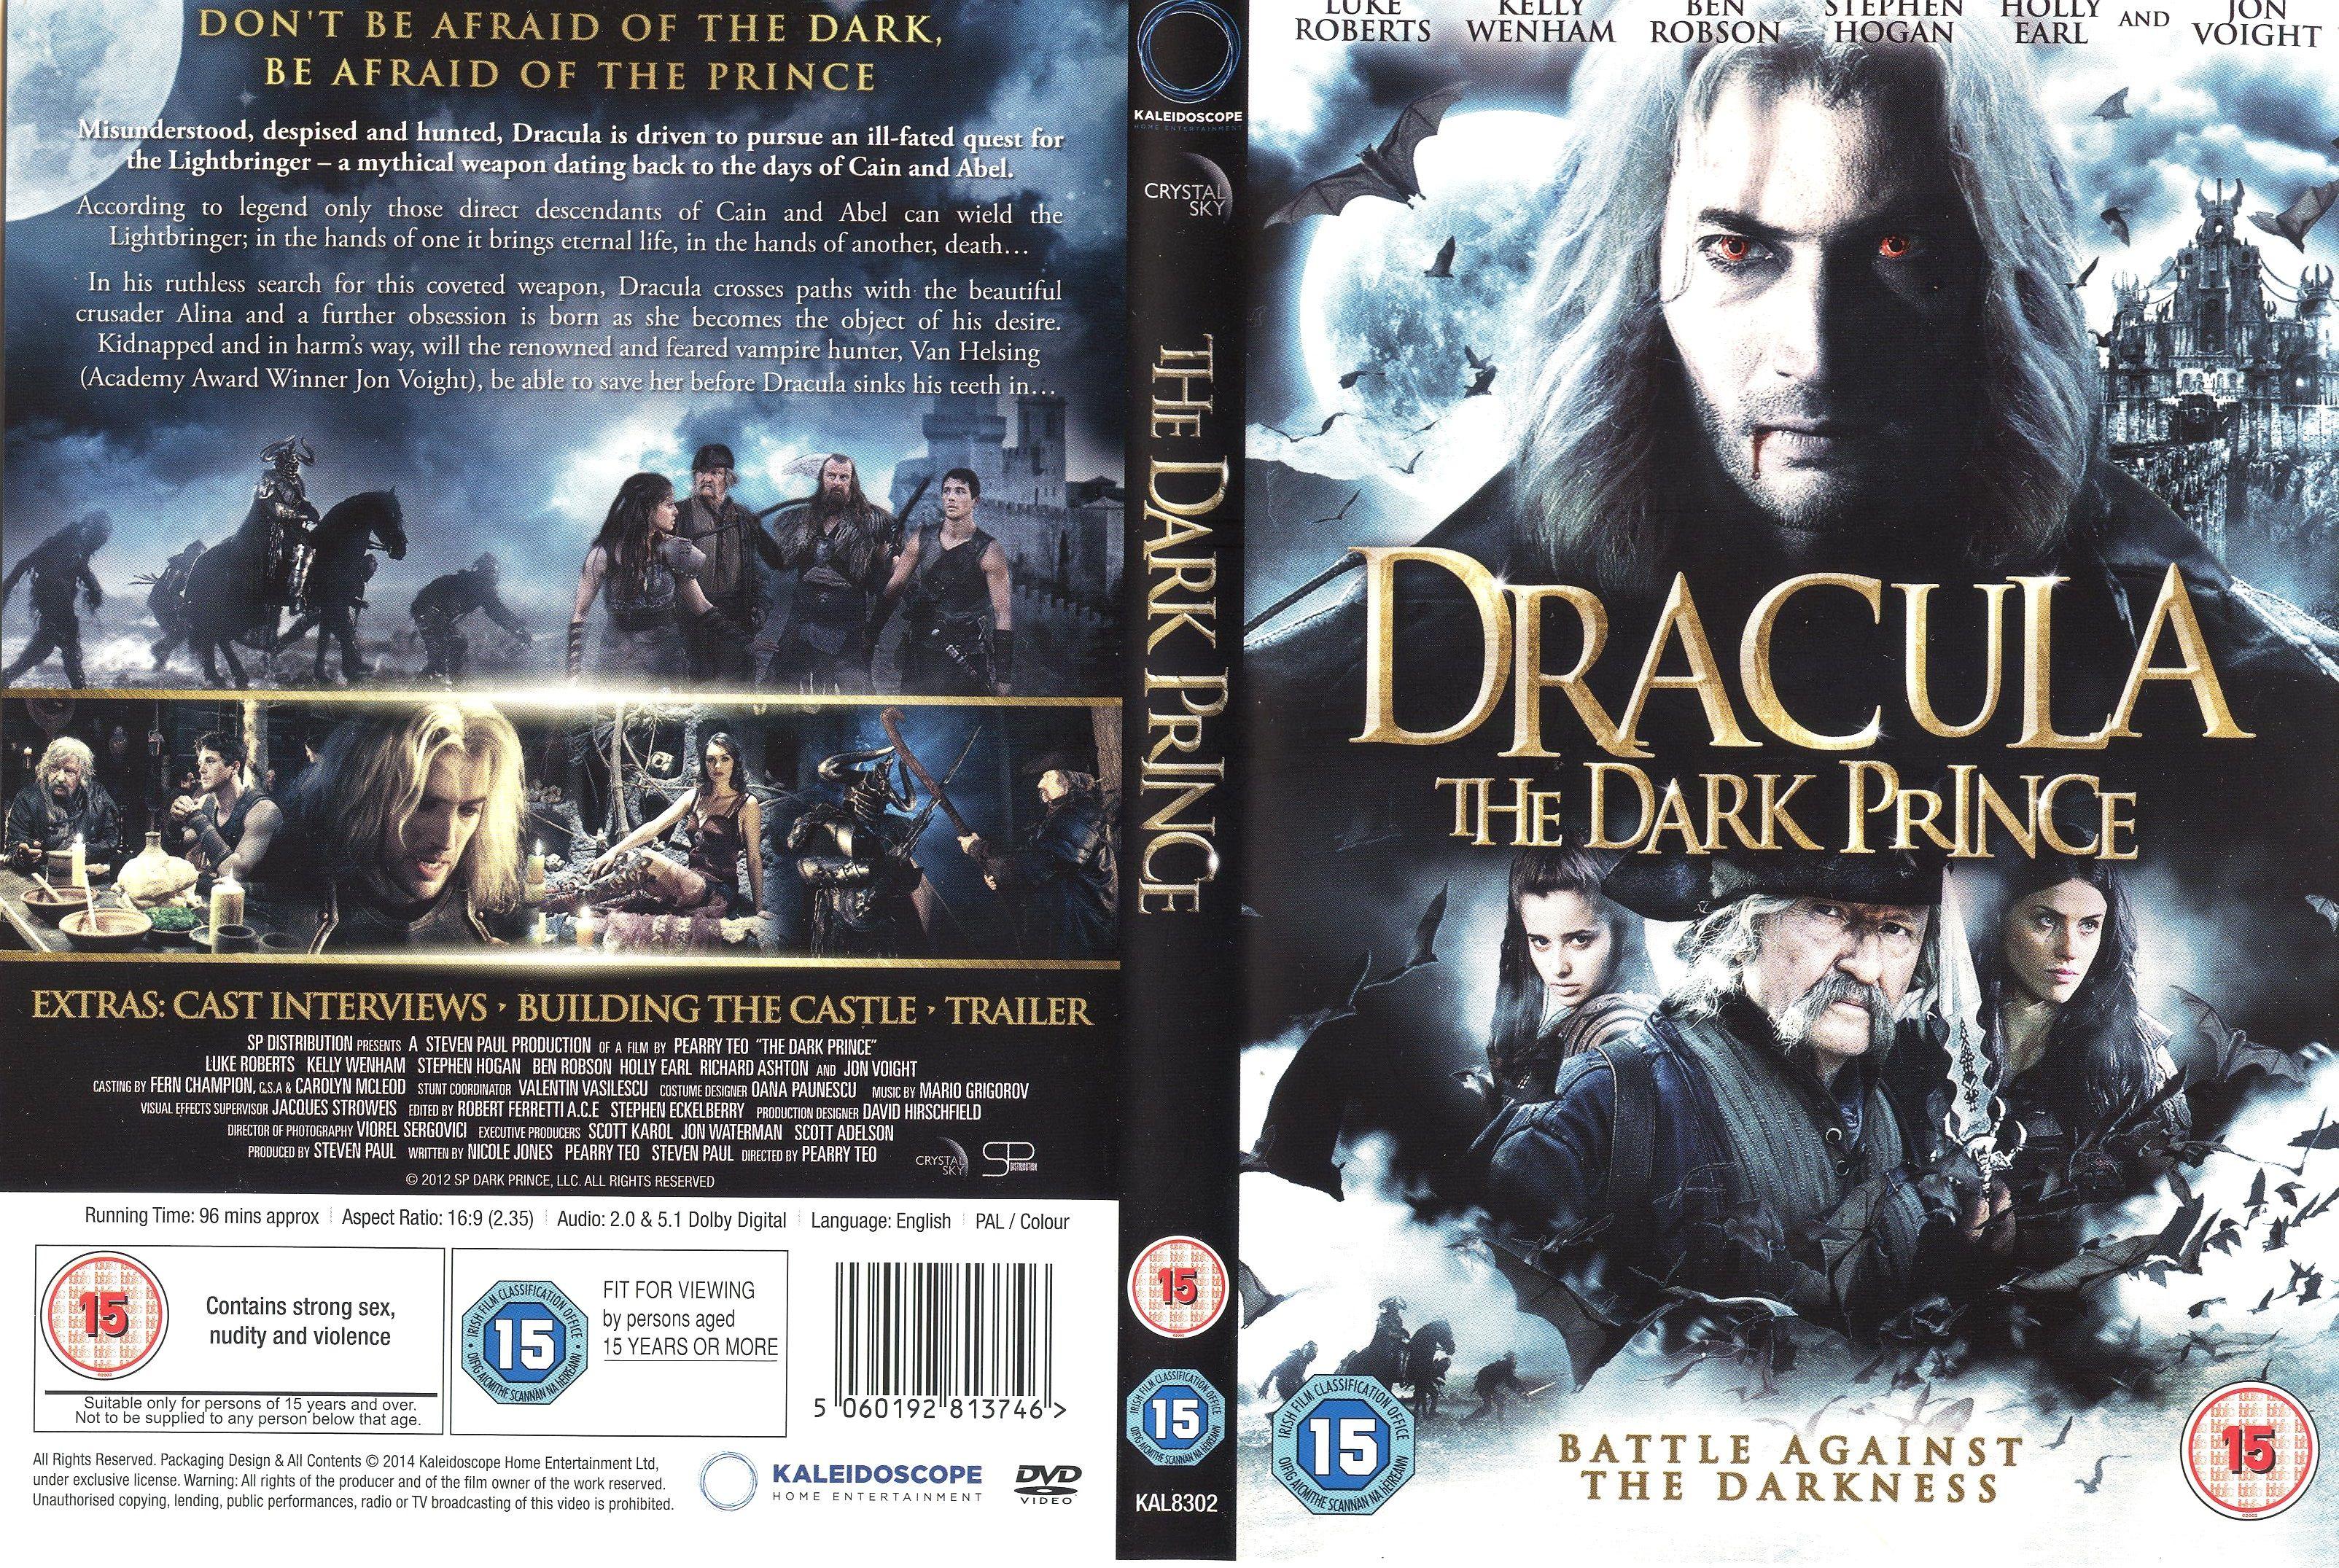 Dracula The Dark Prince 2013 Usa